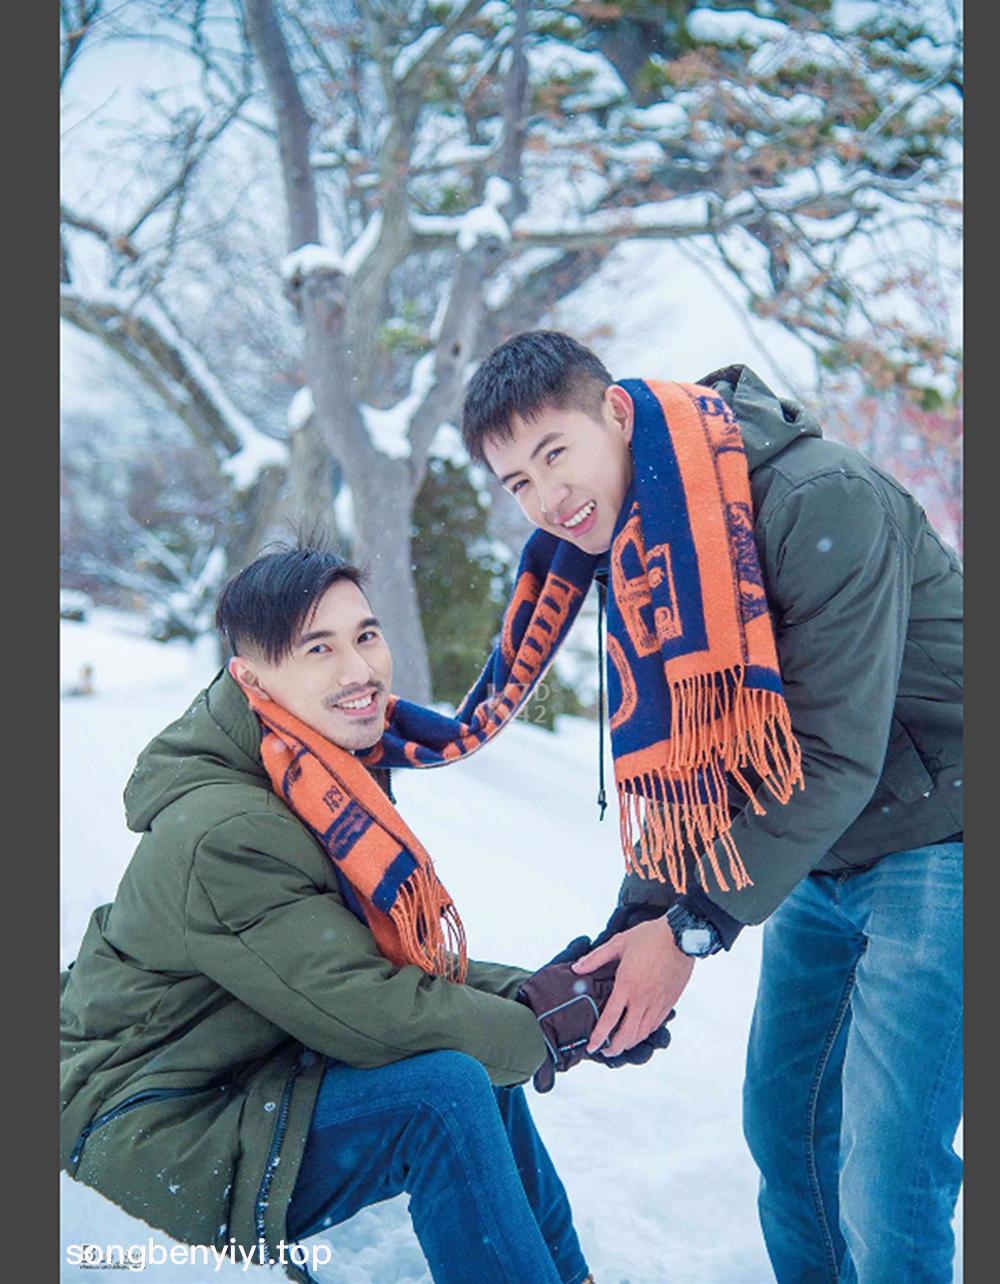 WHOSEMAN NO.13阿部&安東尼-追尋白色戀人的浪漫【藝術全見版】【ebook】-08.png